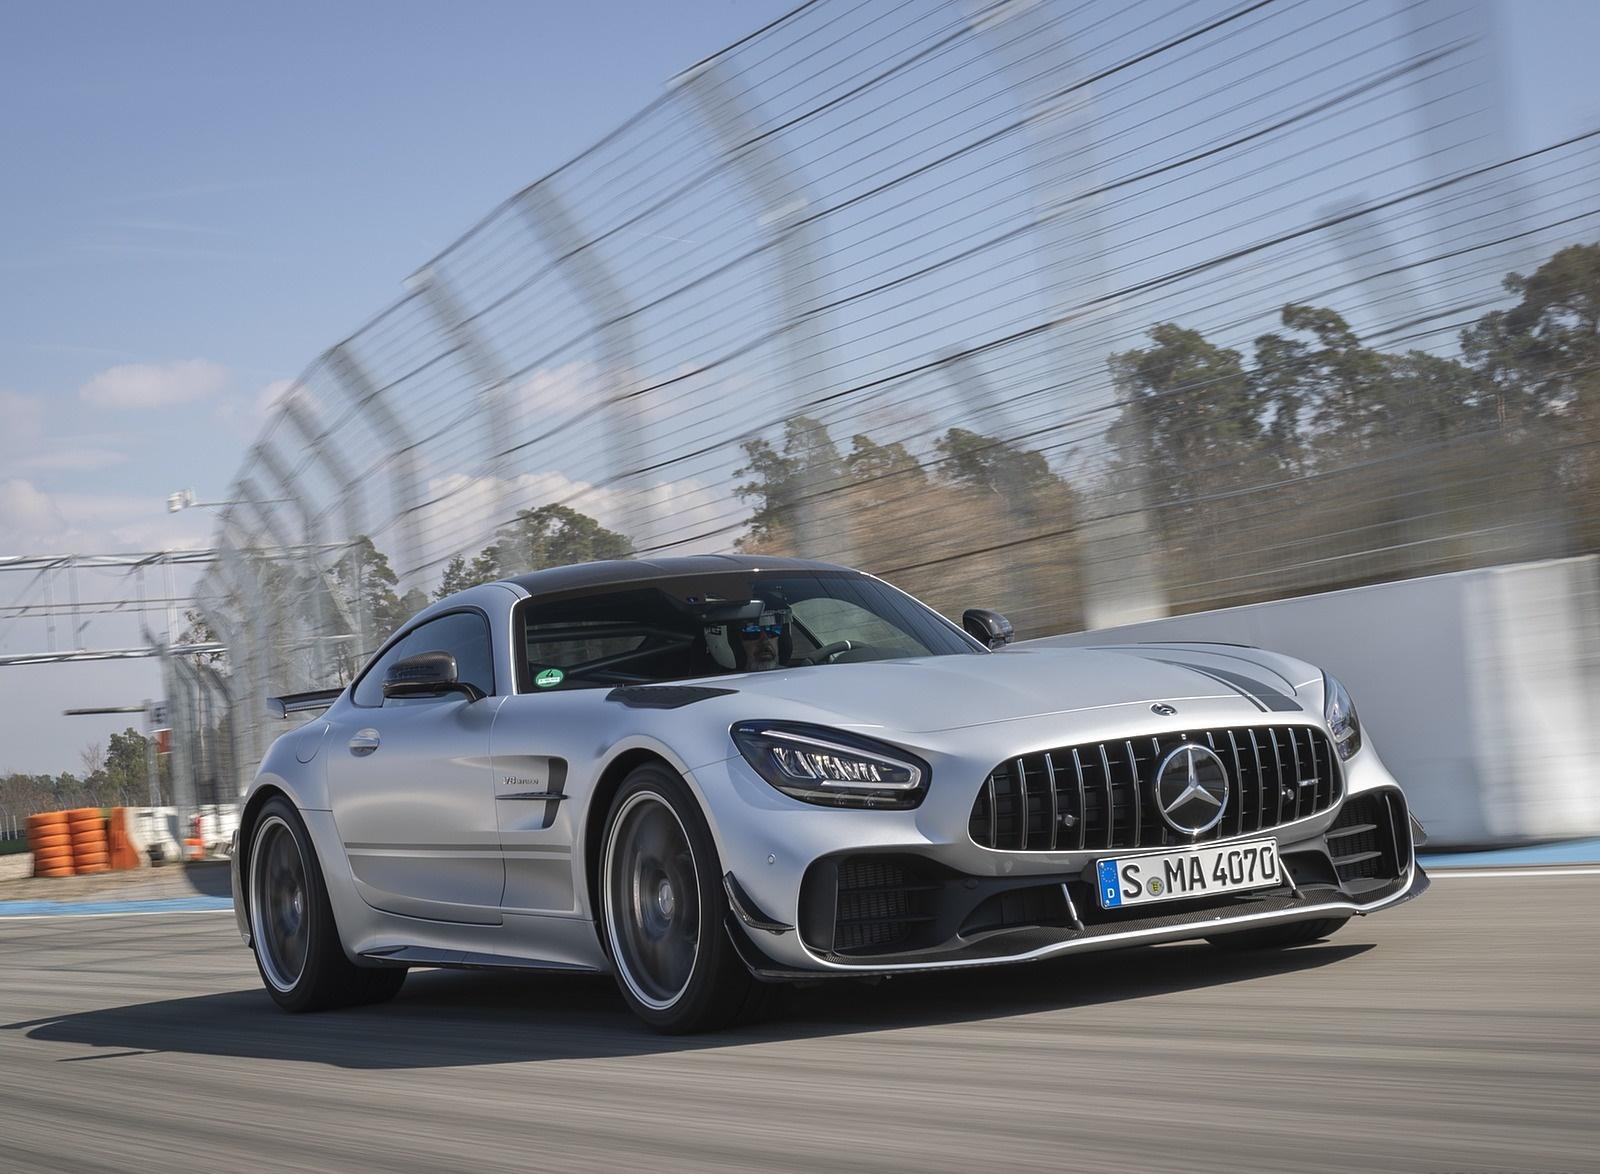 2020 Mercedes-AMG GT R Pro (Color: Designo Iridium Silver magno) Front Three-Quarter Wallpapers (2)